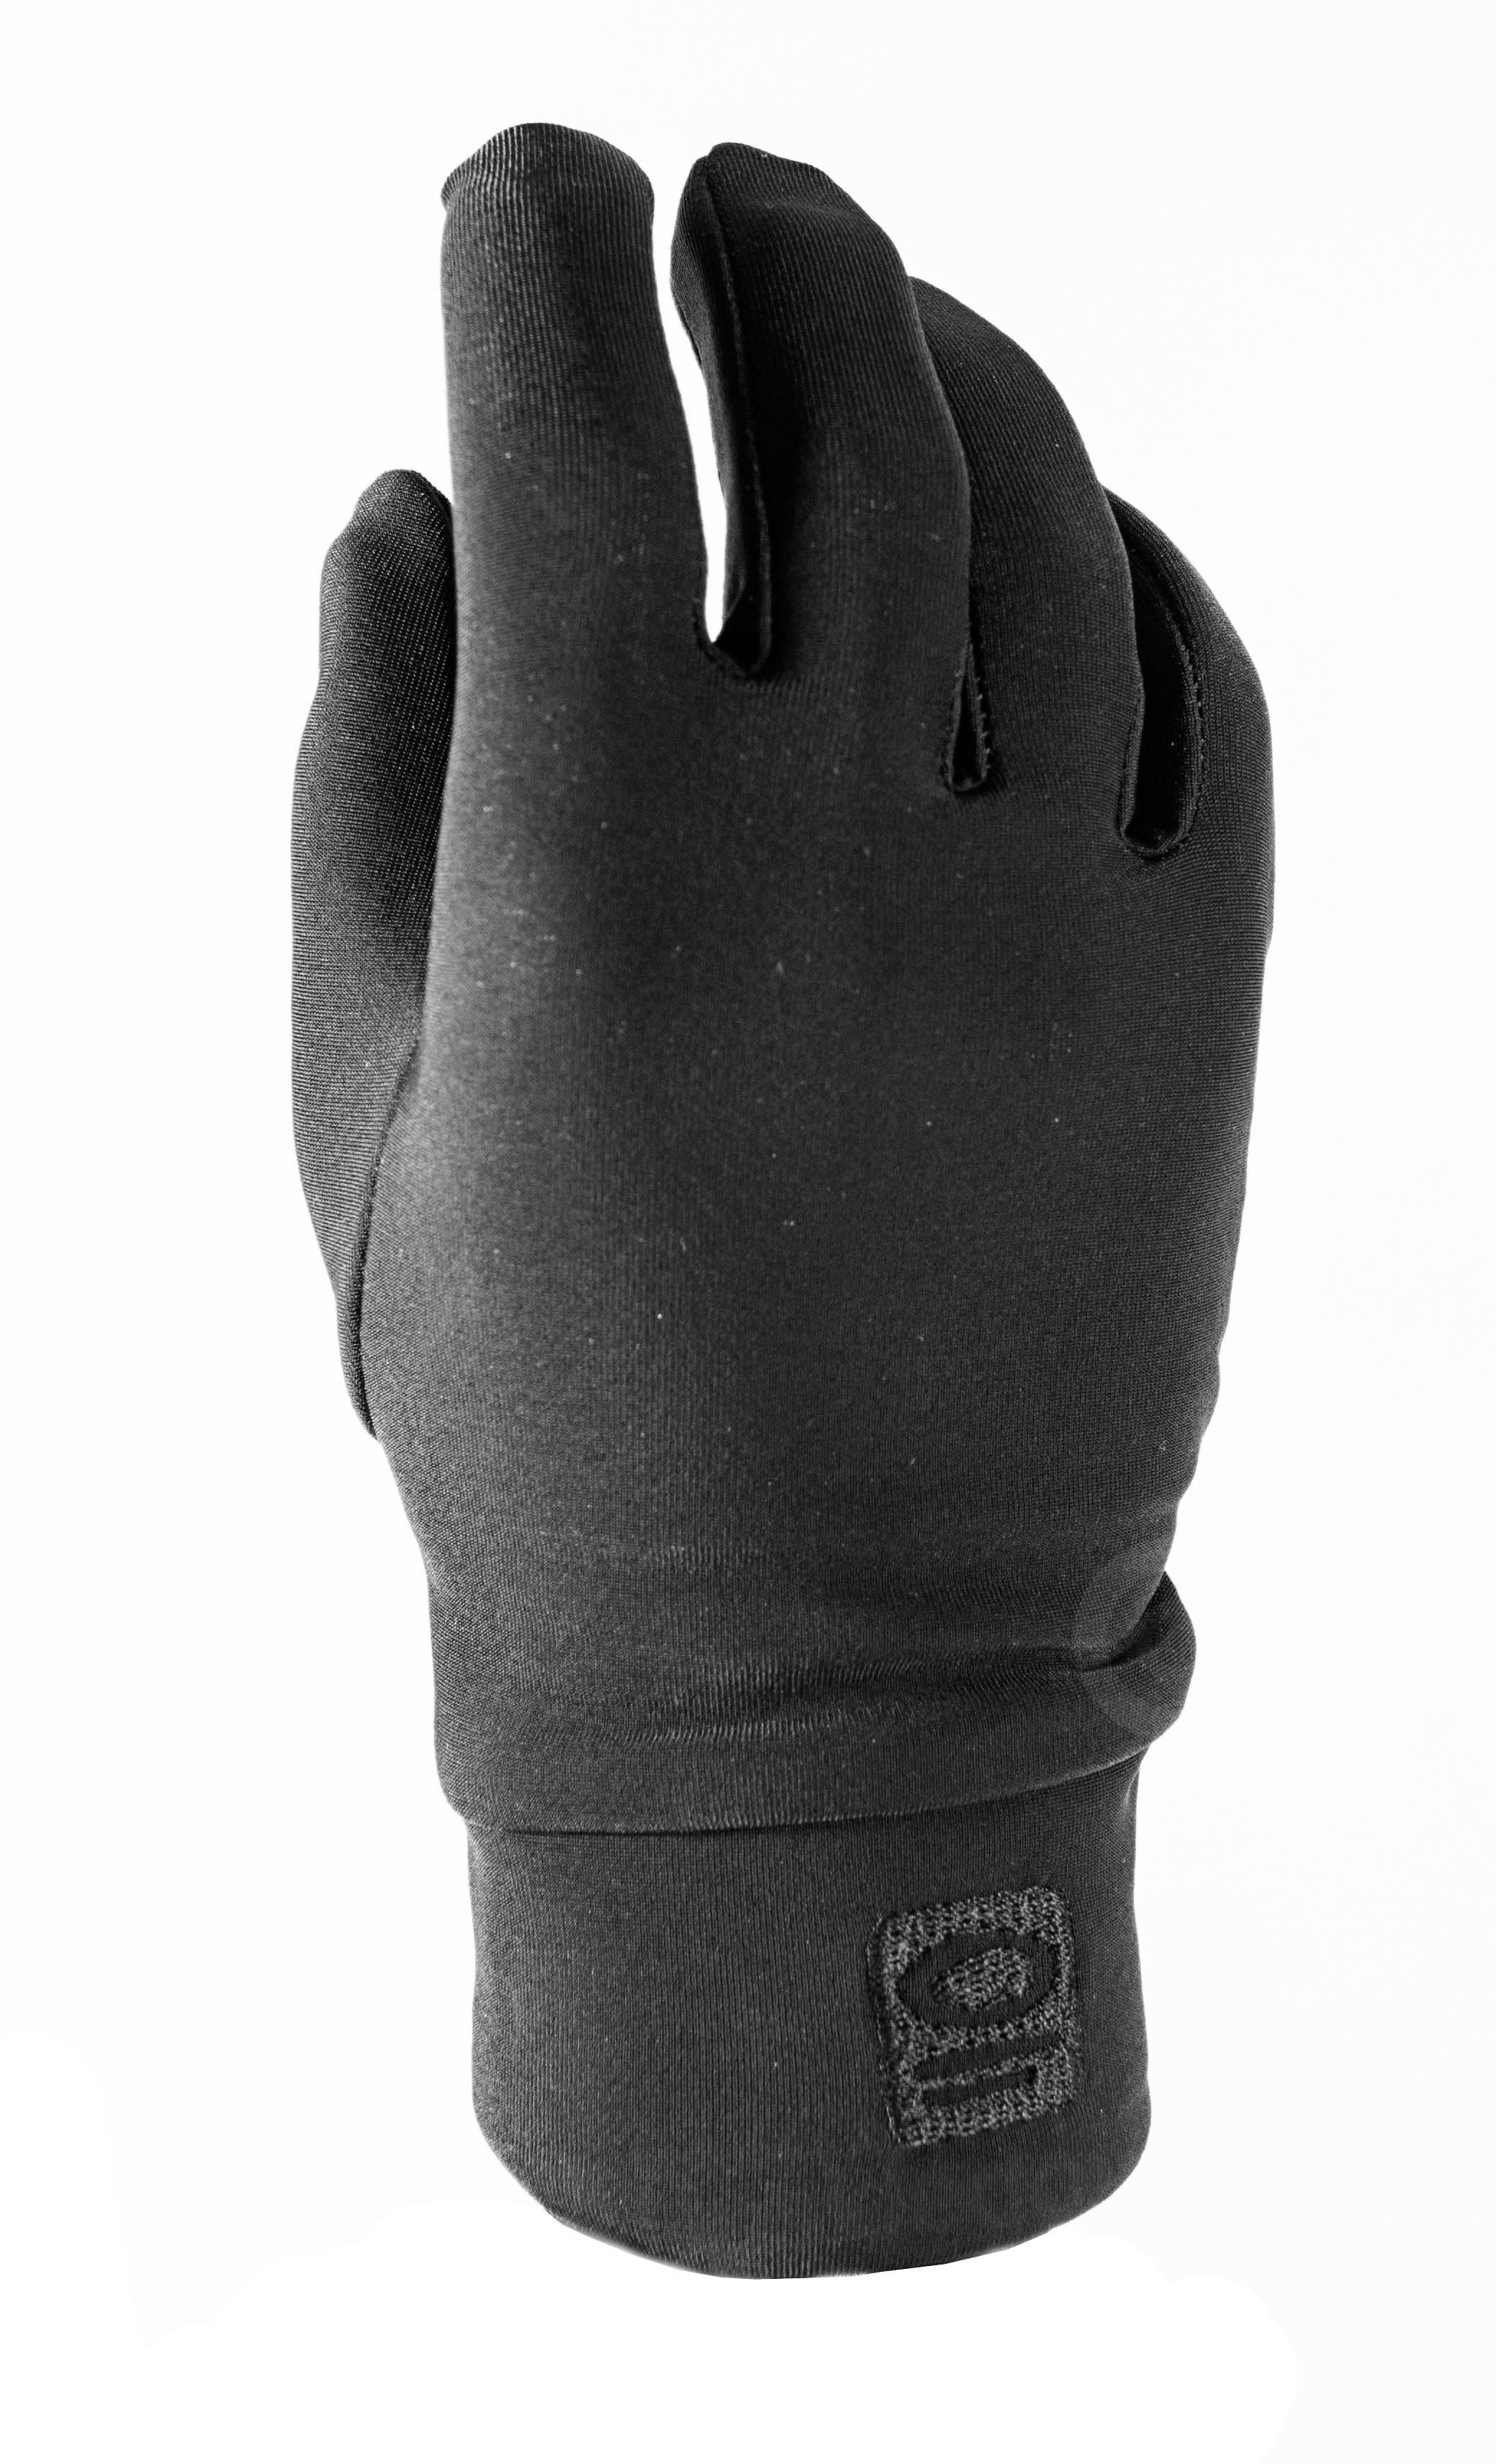 Upsidedown Ισοθερμικά γάντια KANFOR Solu 1349e0b1558